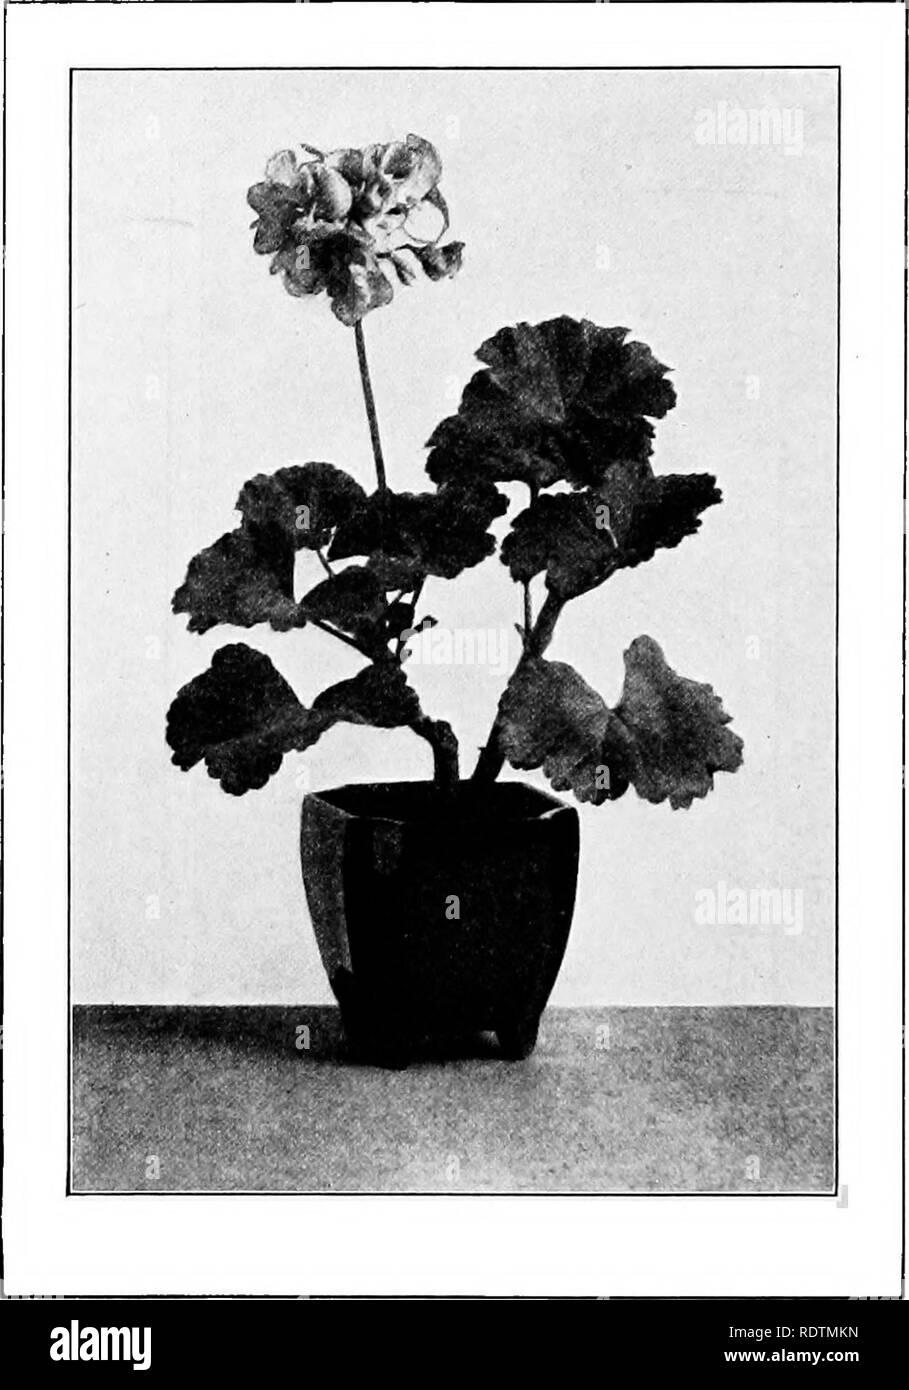 The school garden book  School gardens  Single Geranium in a